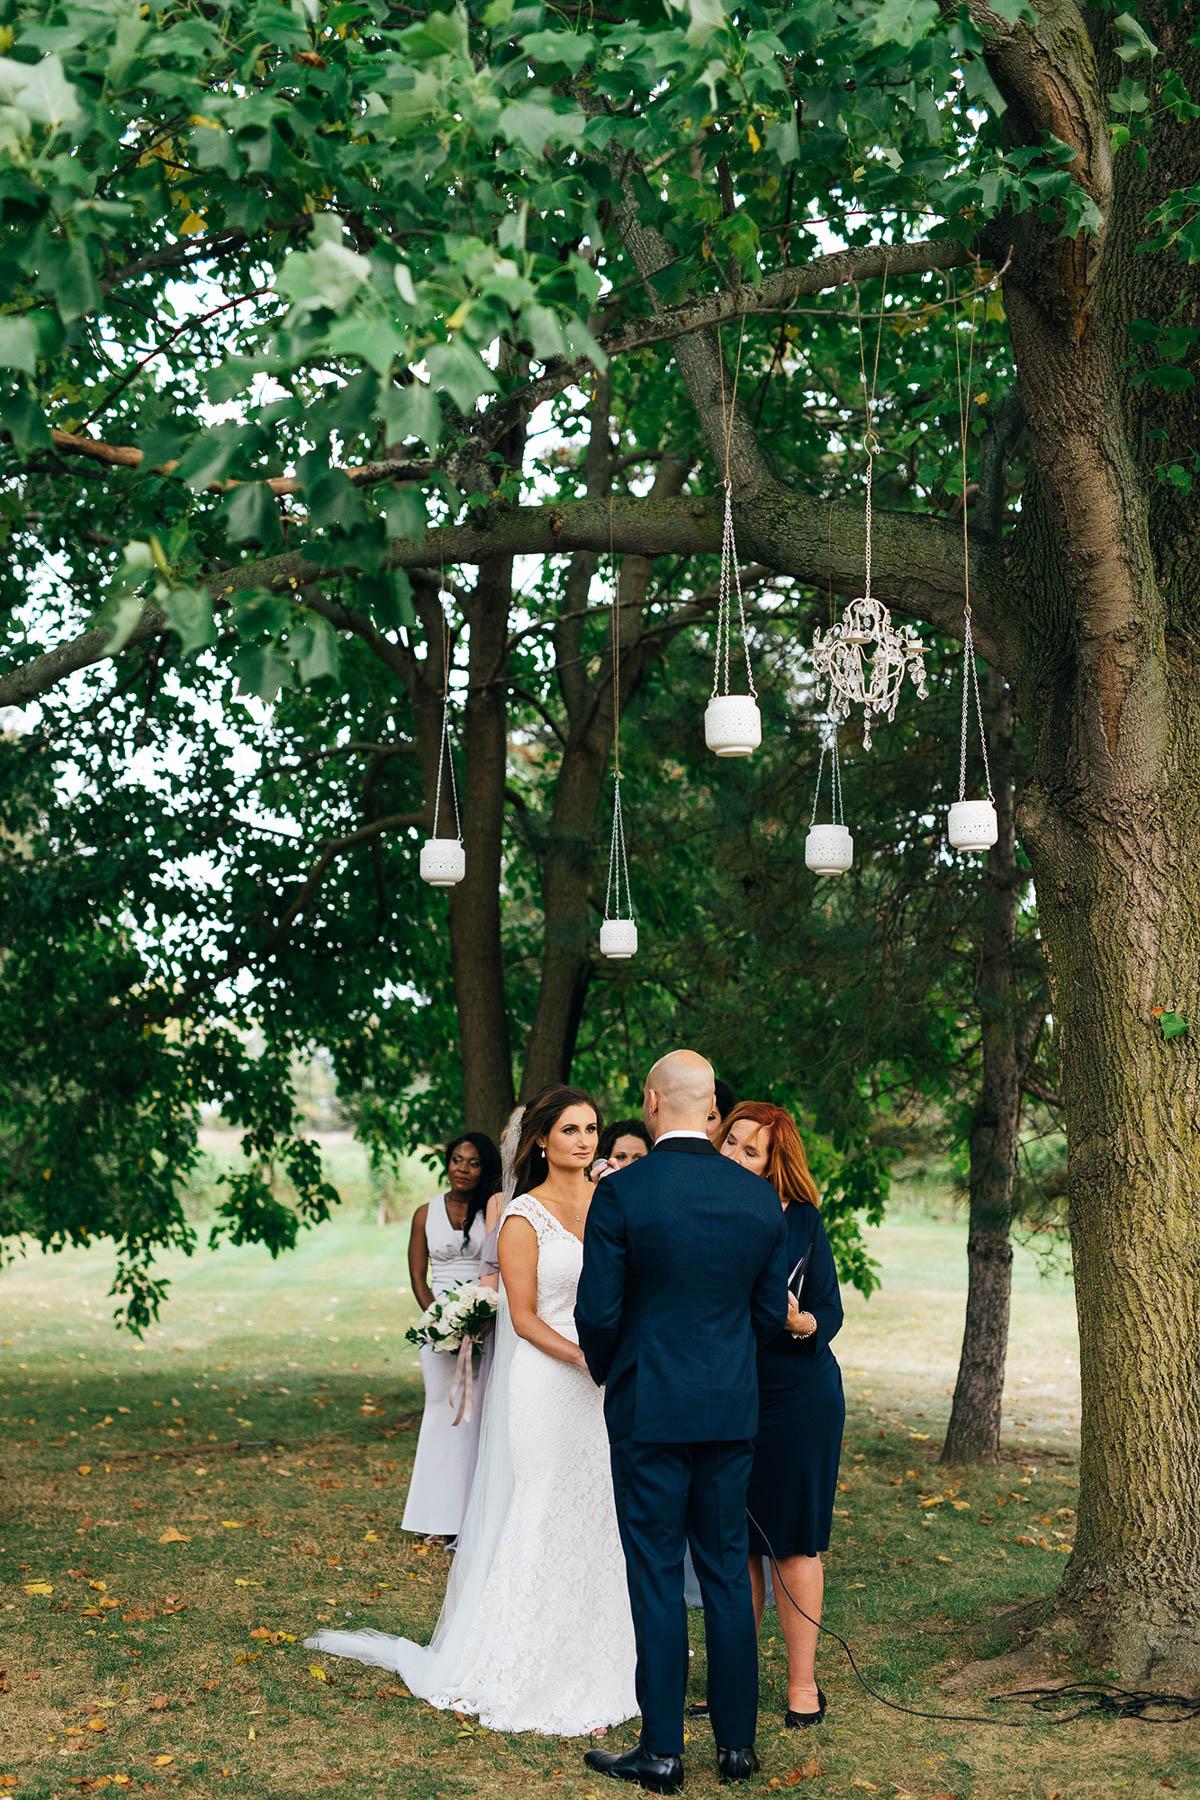 shaw-events-vineyard-bride-swish-list-kurtz-orchards-niagara-on-the-lake-wedding-77.jpg